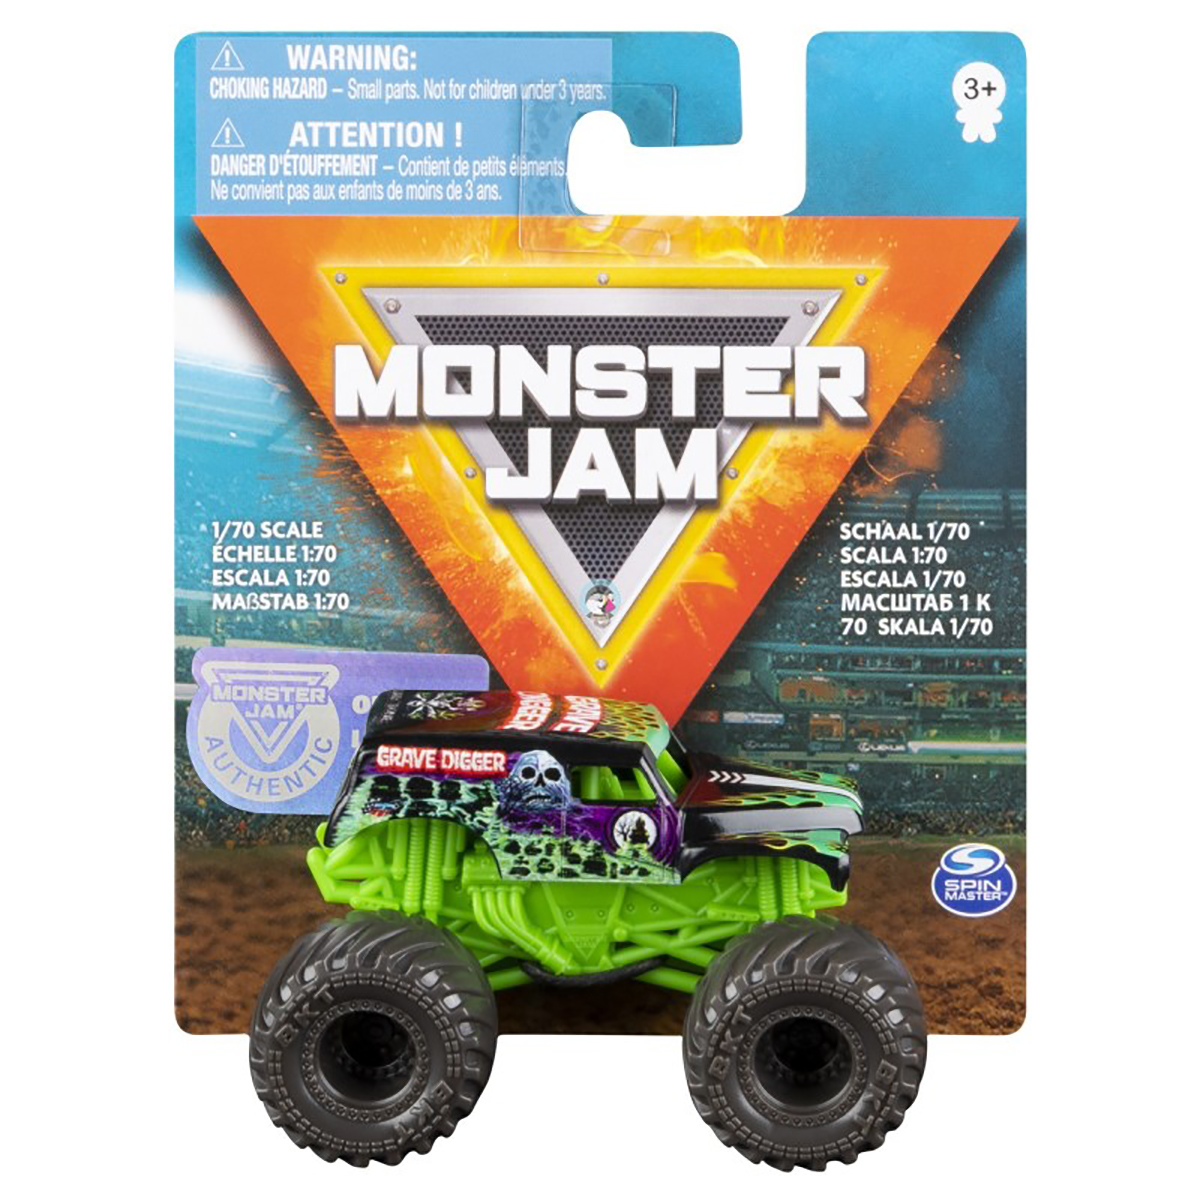 Masinuta Monster Jam 1:70, Grave Digger, 20120609